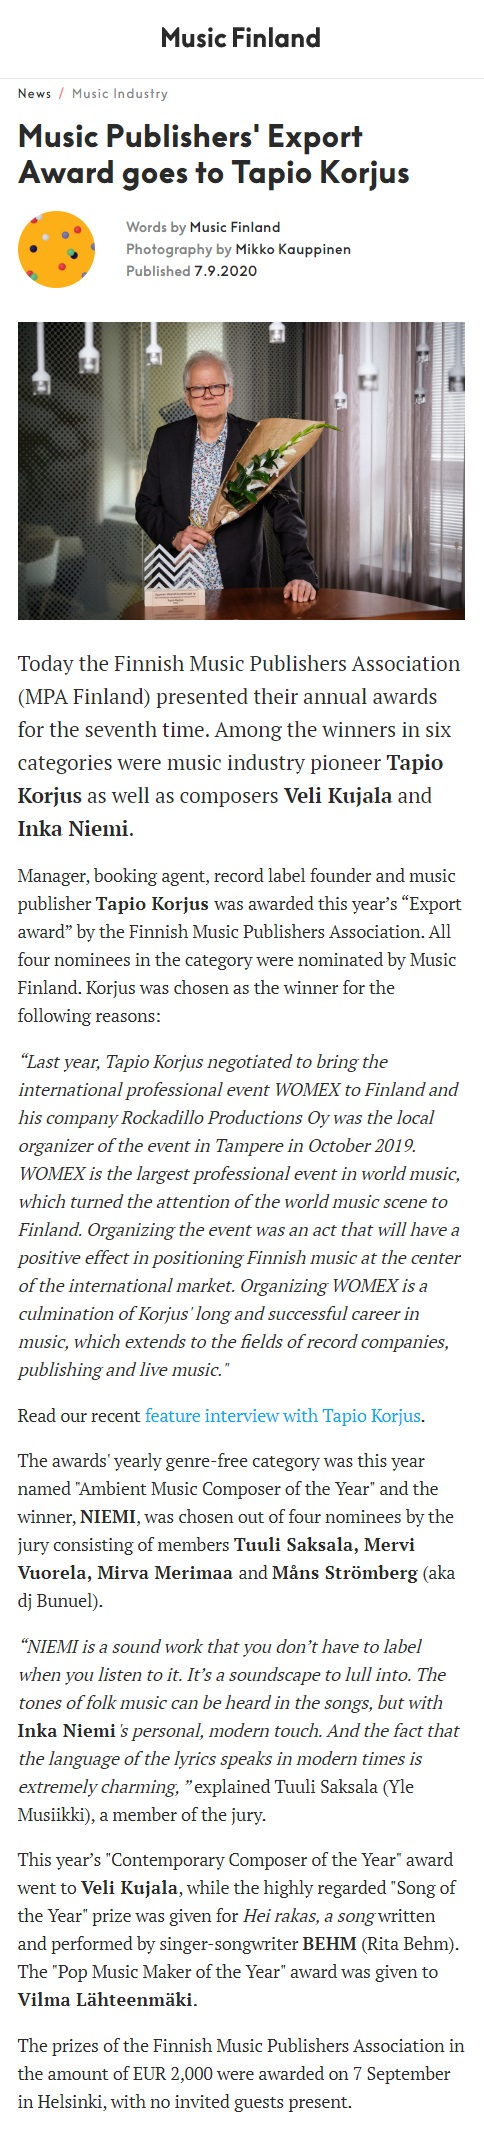 Music Finland (Finland), 7.9.2020